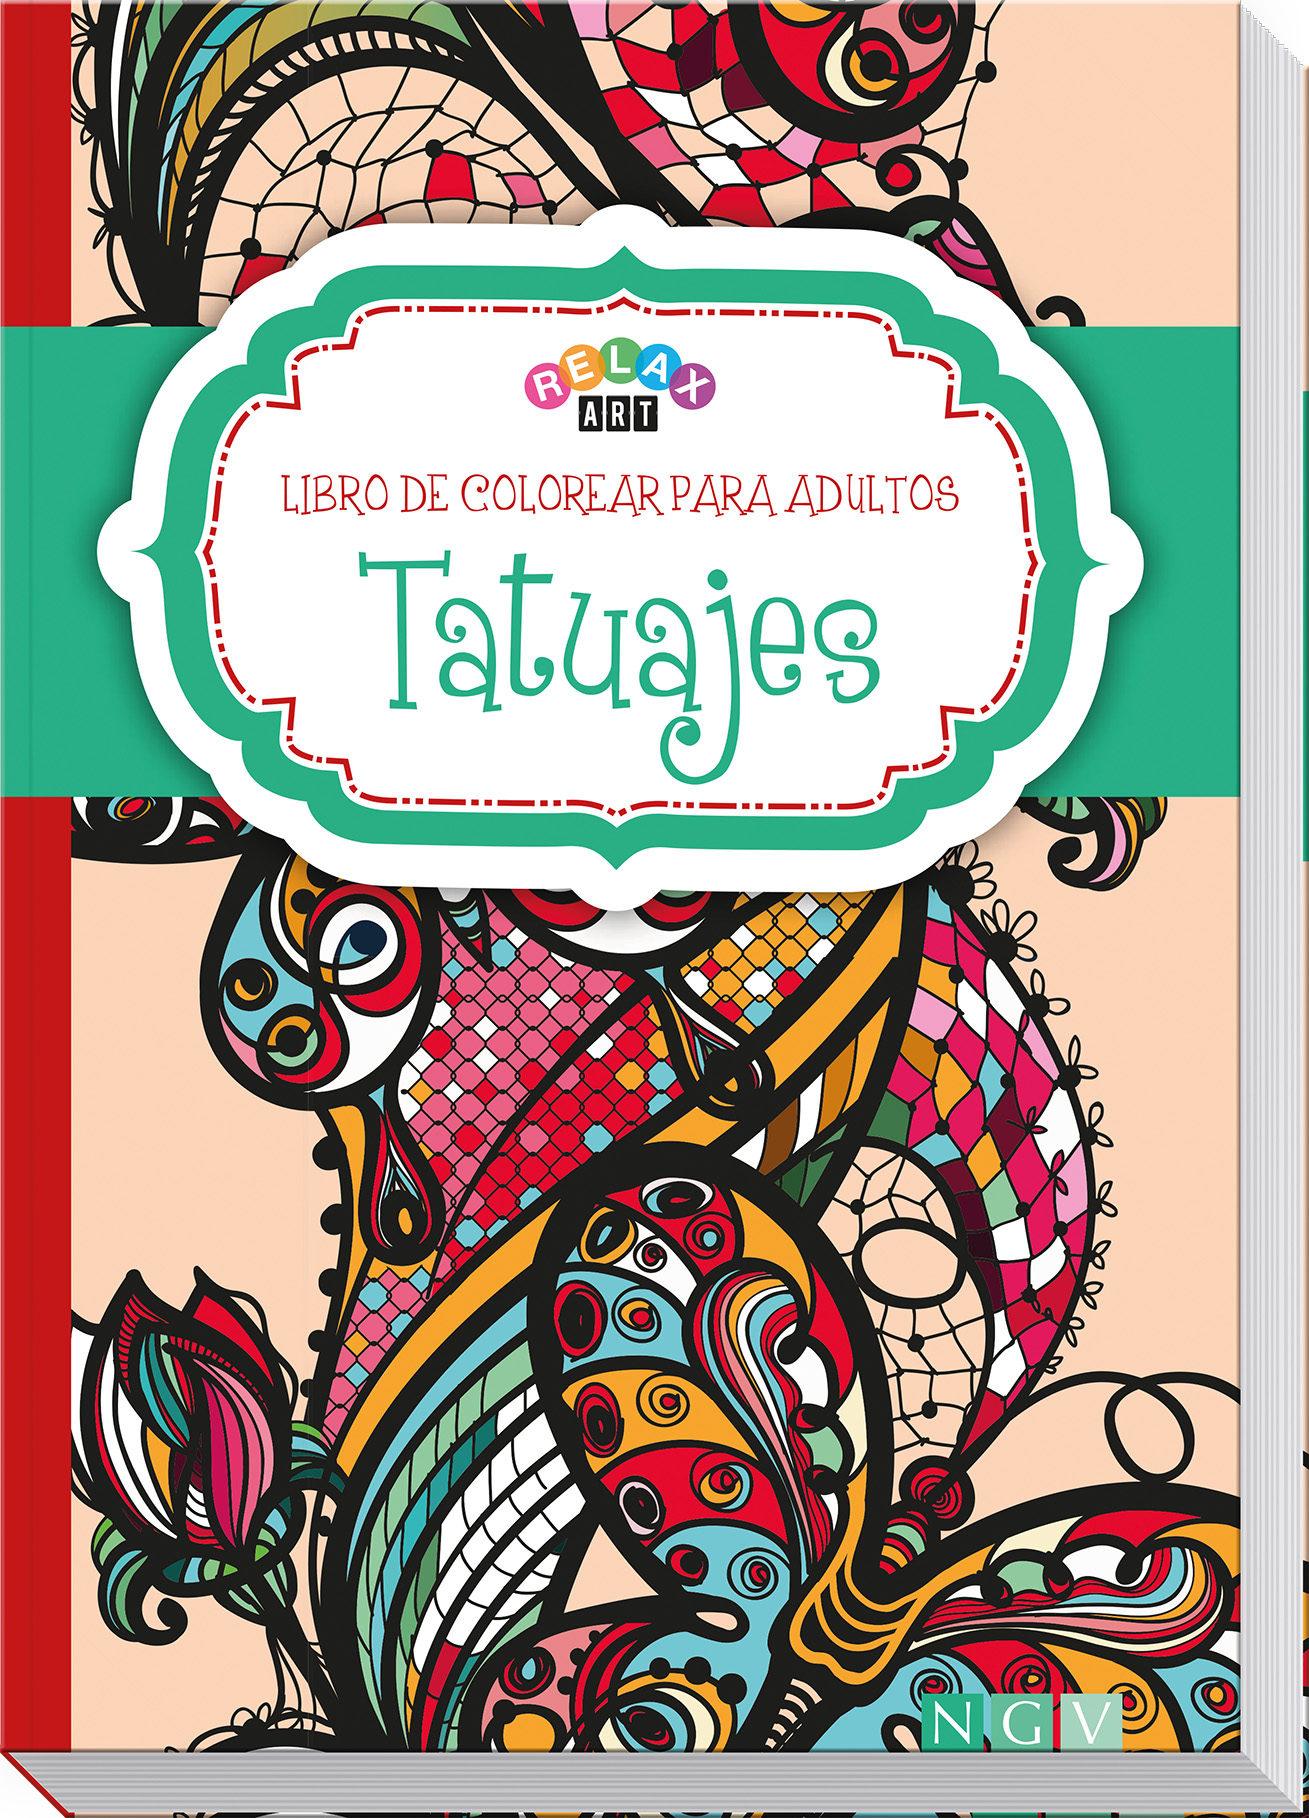 TATUAJES (COLOREAR PARA ADULTOS) | VV.AA. | Comprar libro 9783869416724